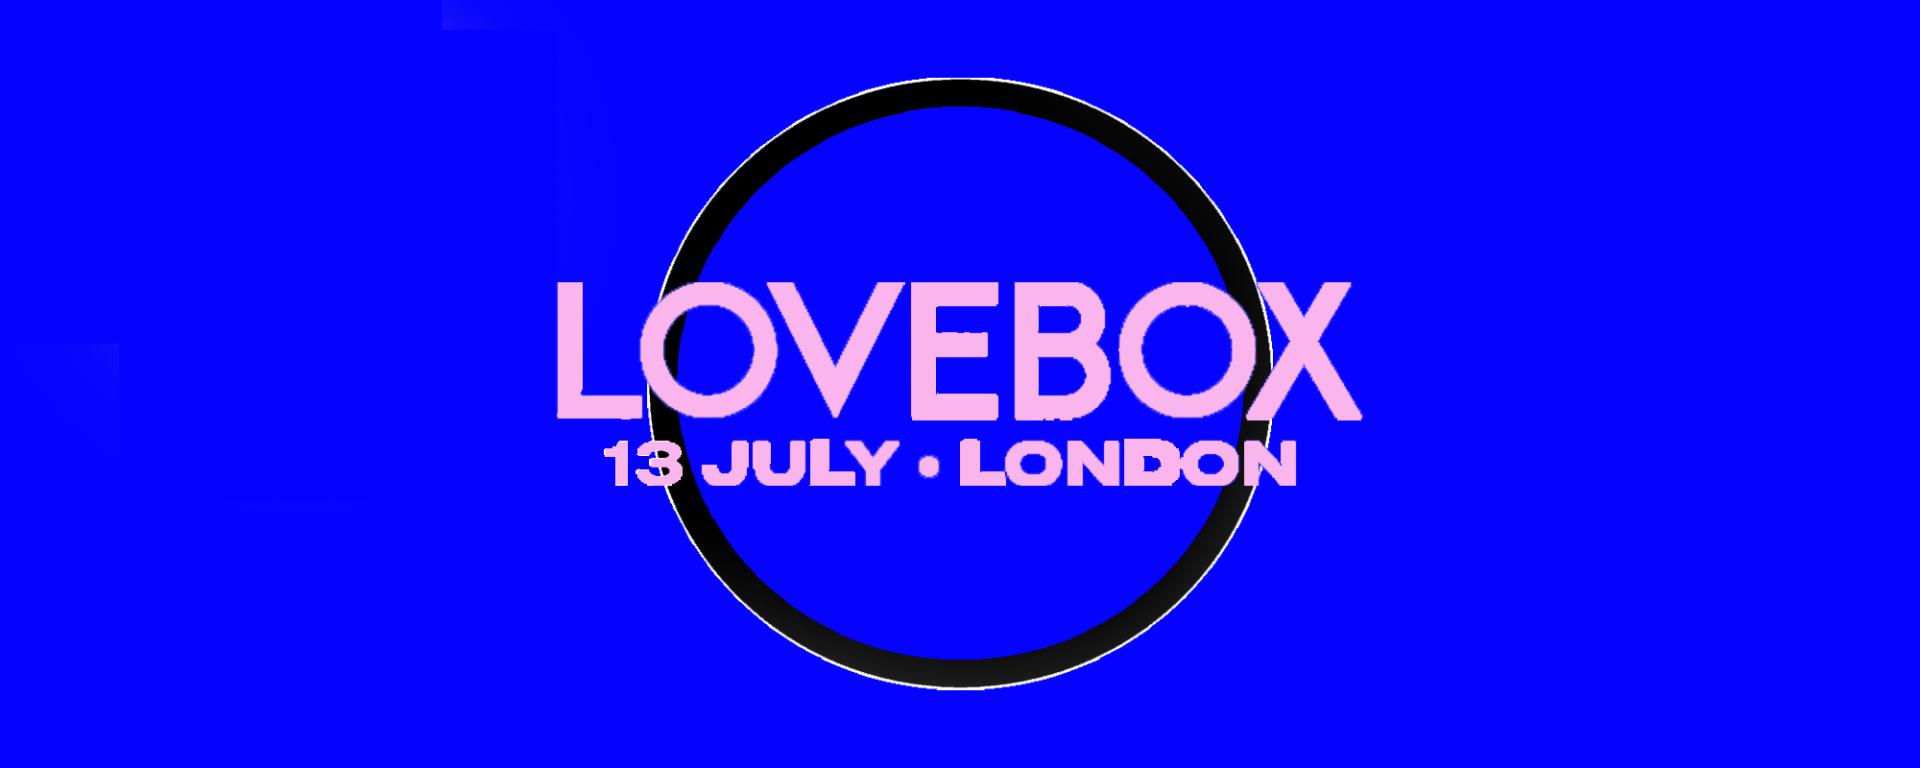 LoveBox Music Festival London Gunnersbury Park 13 July Saturday 2019